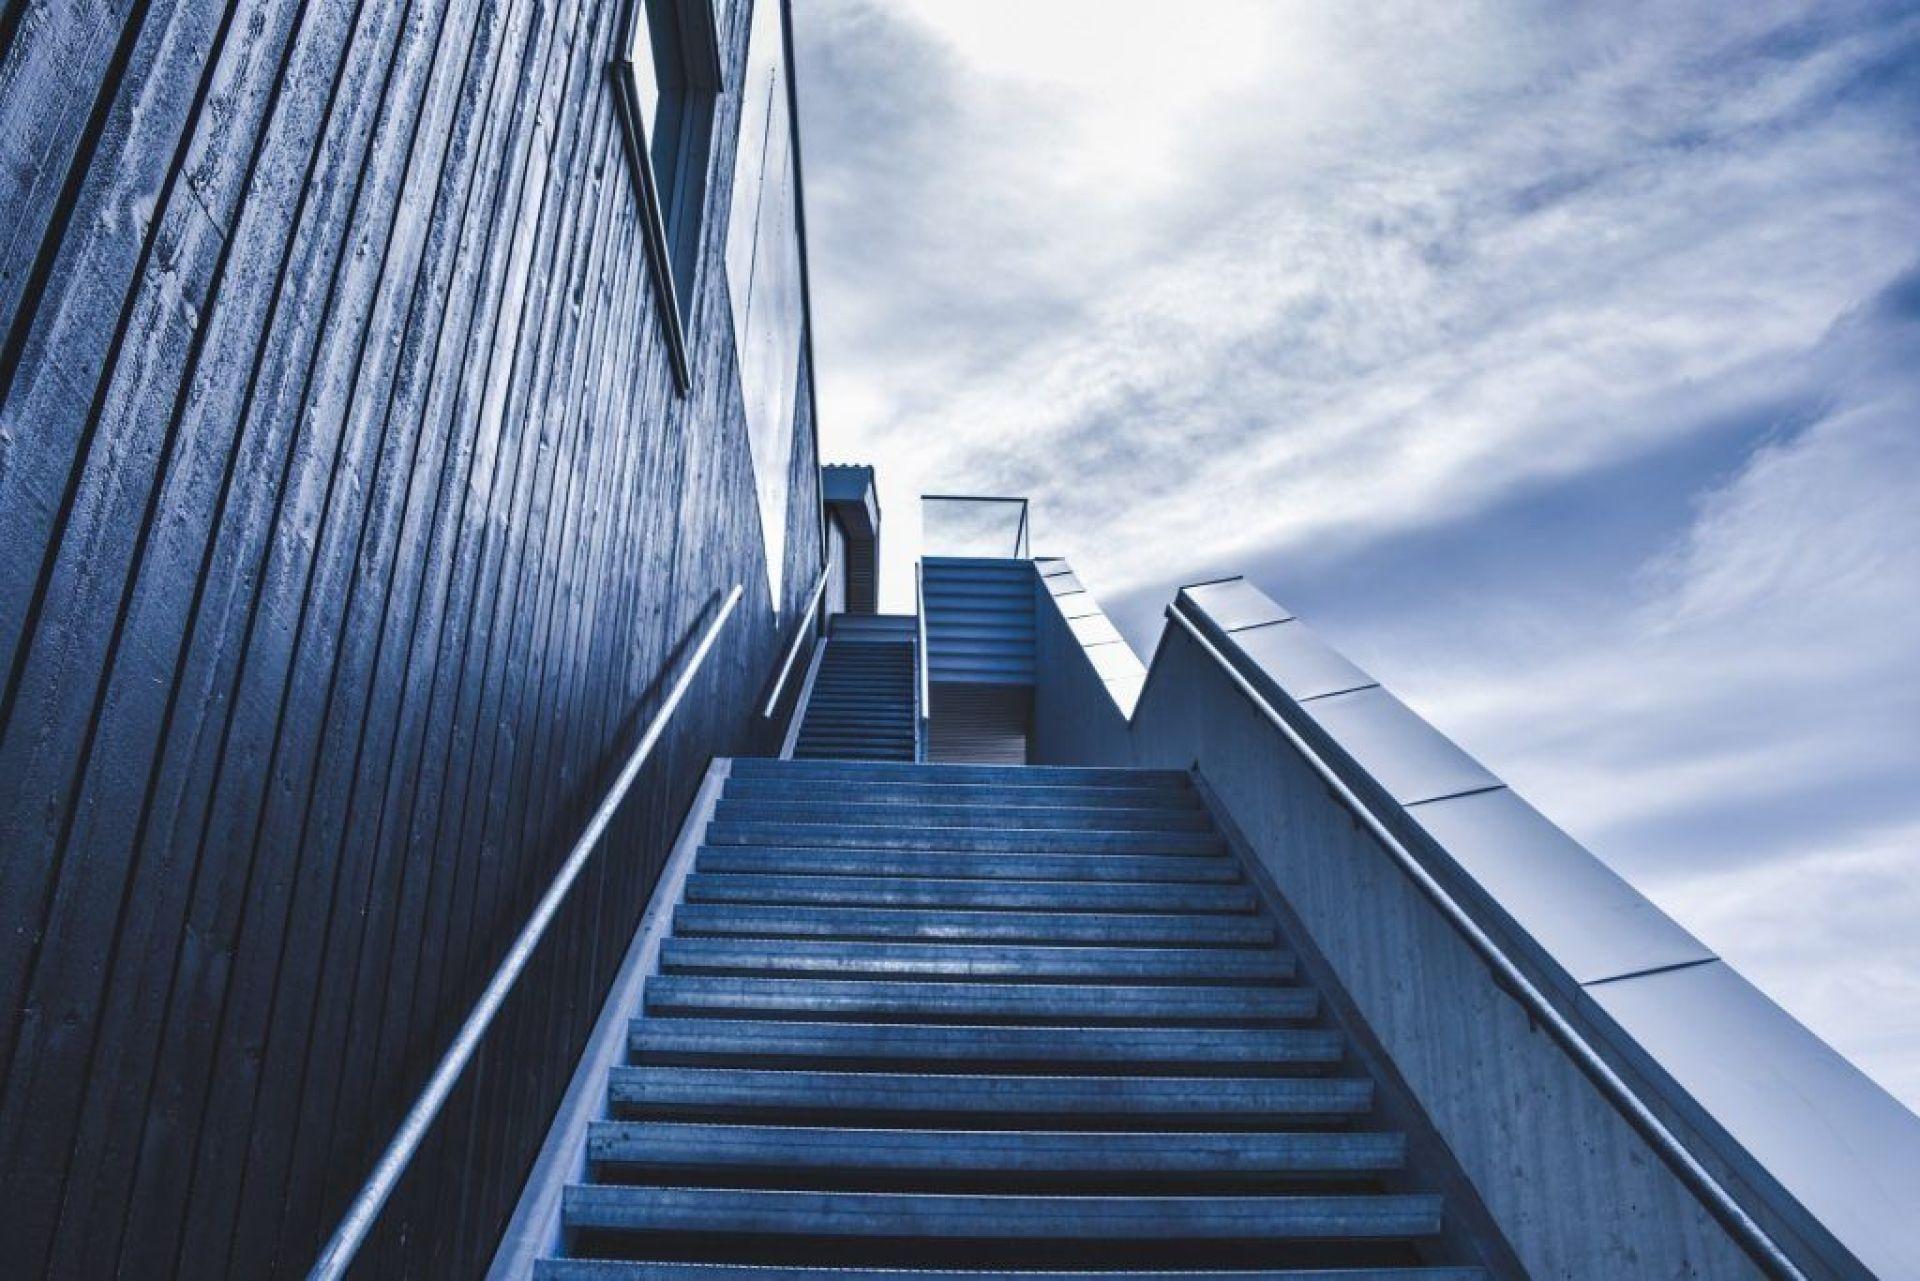 Escalera del éxito profesional